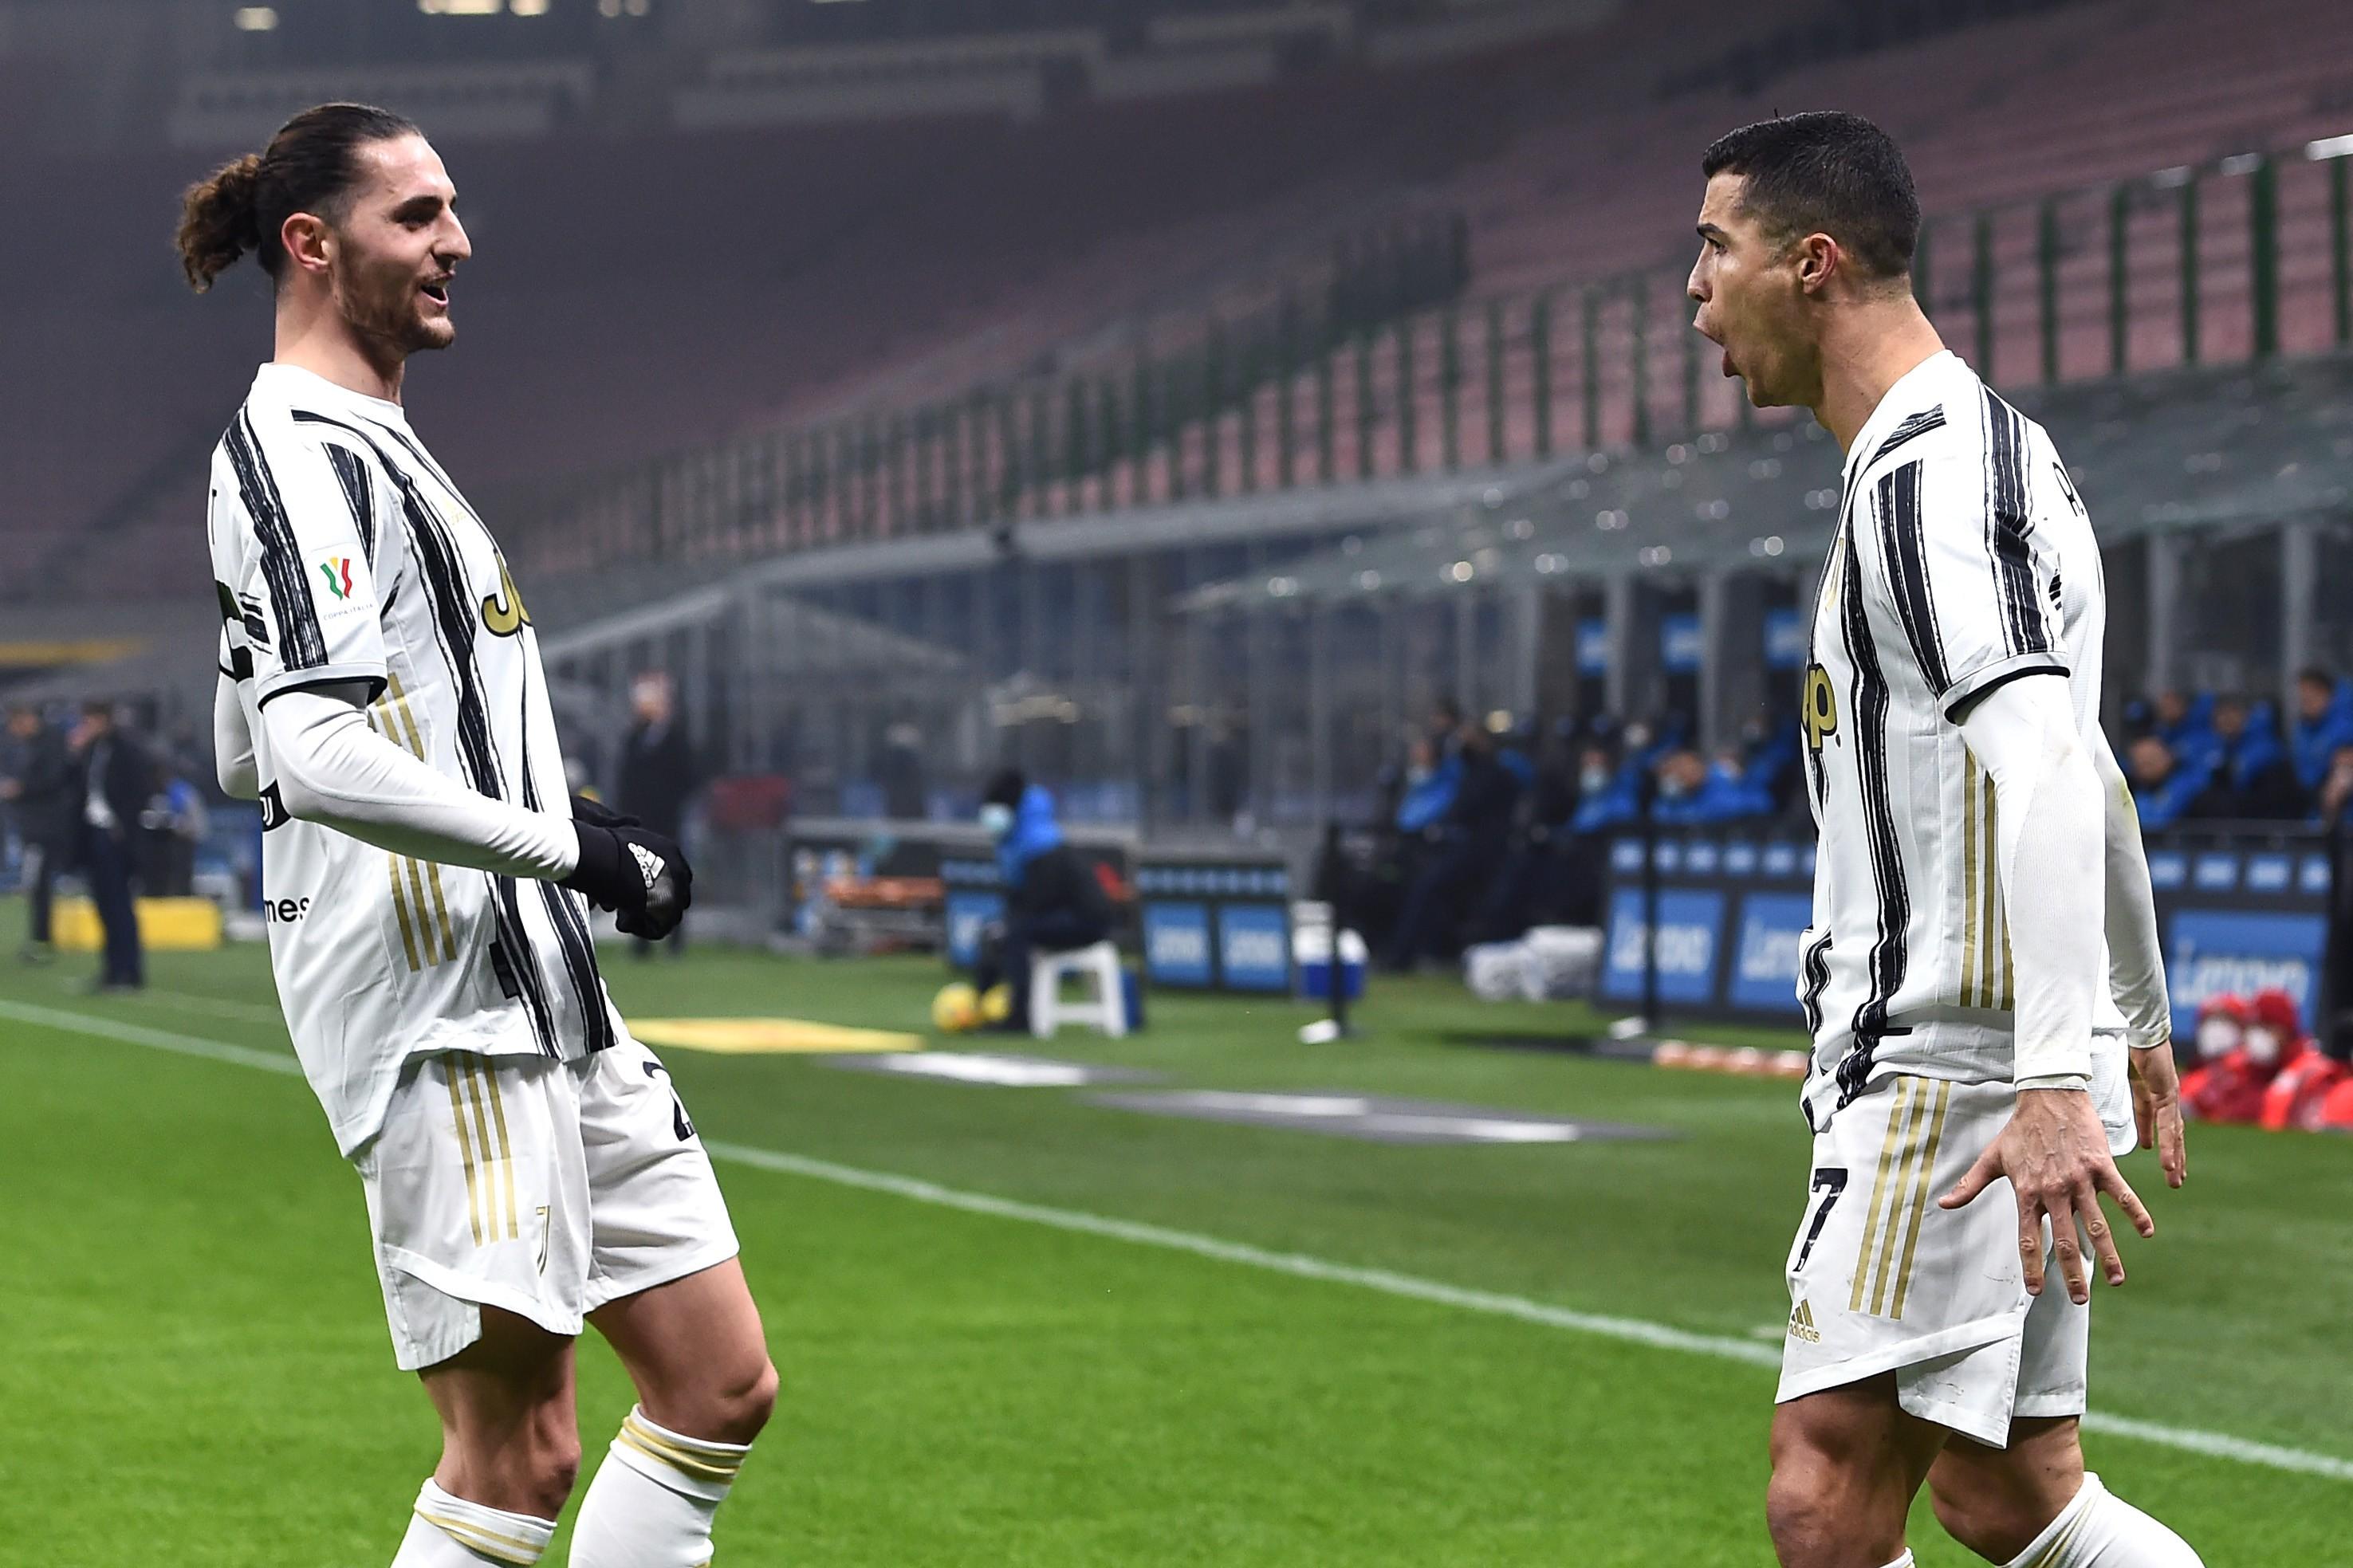 Juve, l'ultima gaffe ha Rabiot come protagonista |  Sport e Vai